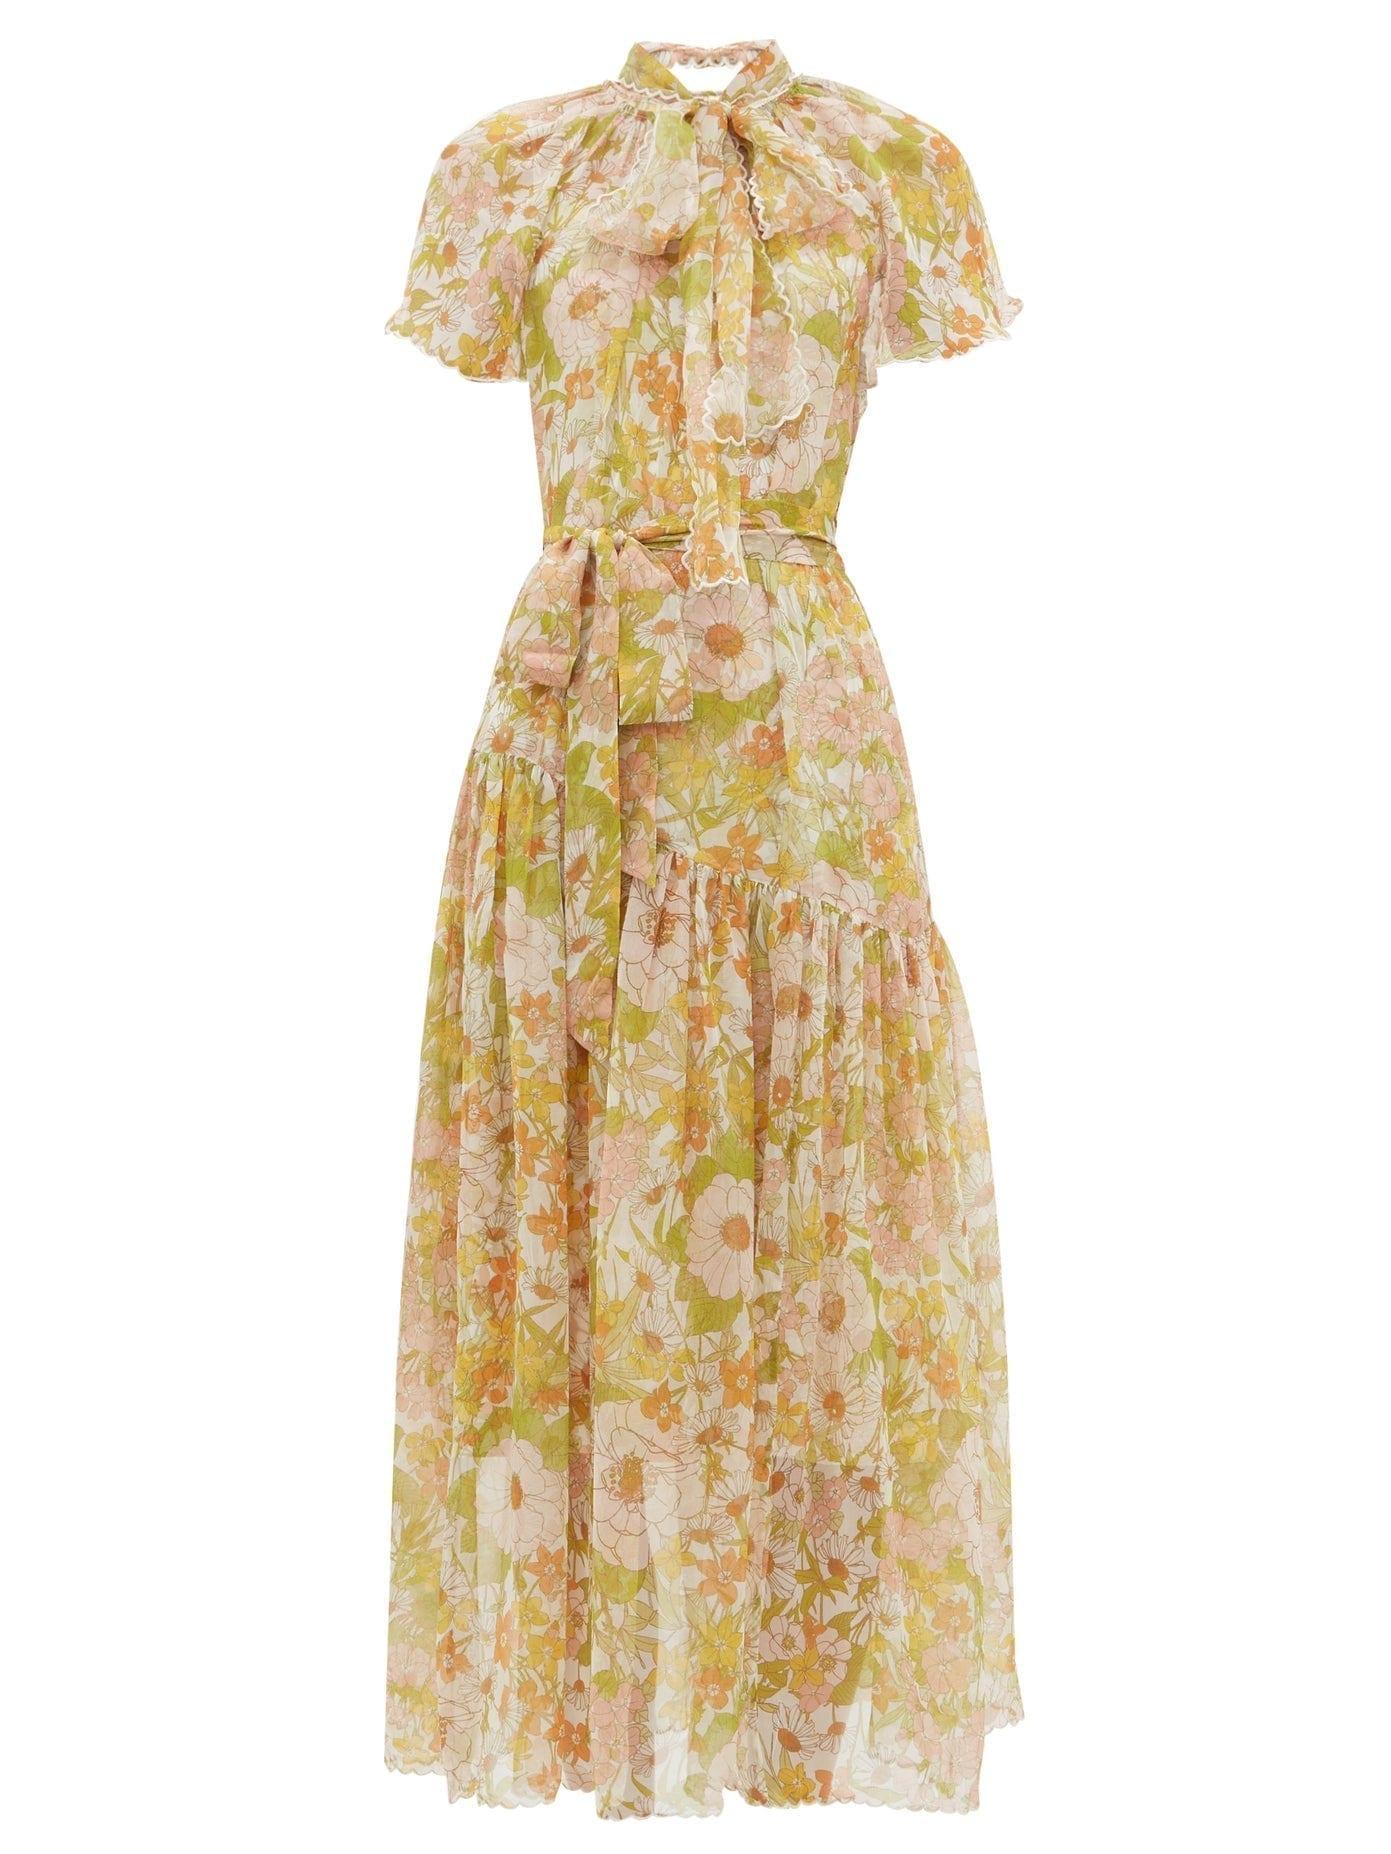 ZIMMERMANN Super Eight Floral-print Silk-chiffon Dress